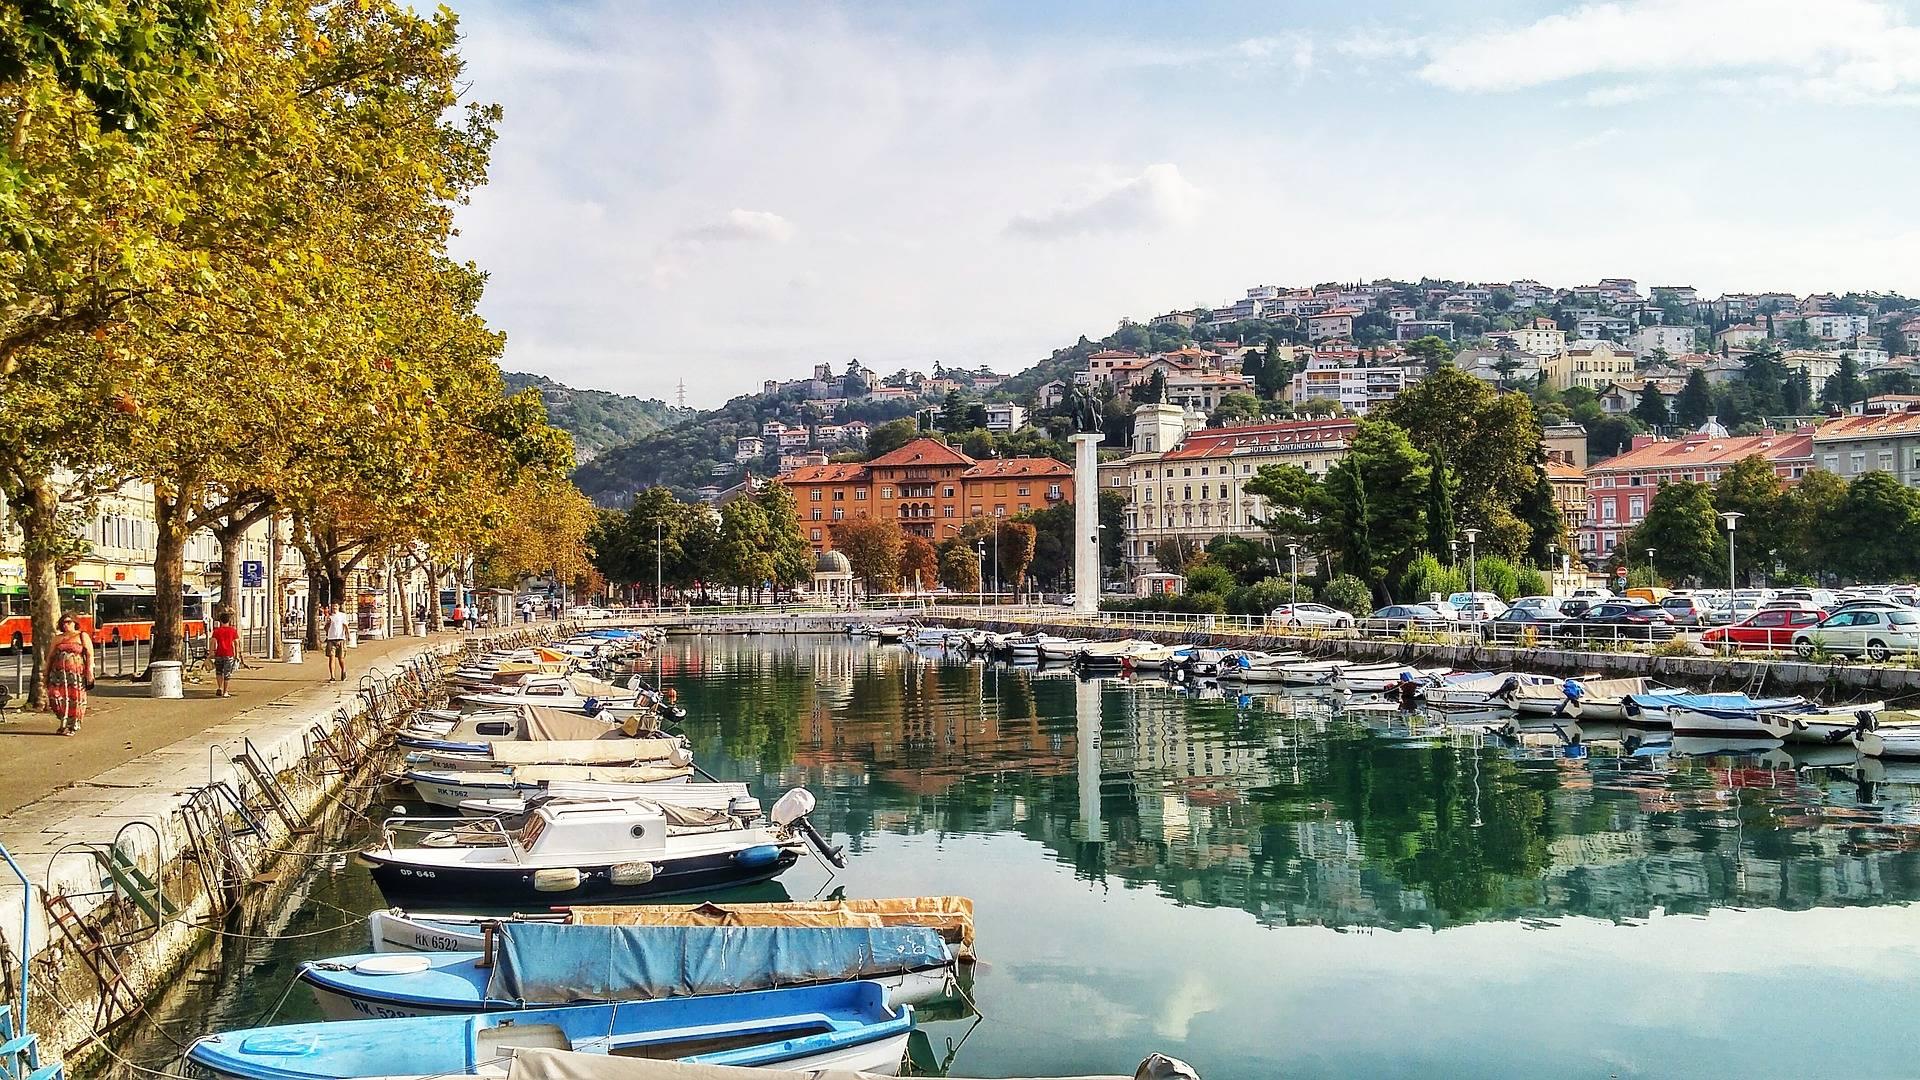 Location de voiture Rijeka